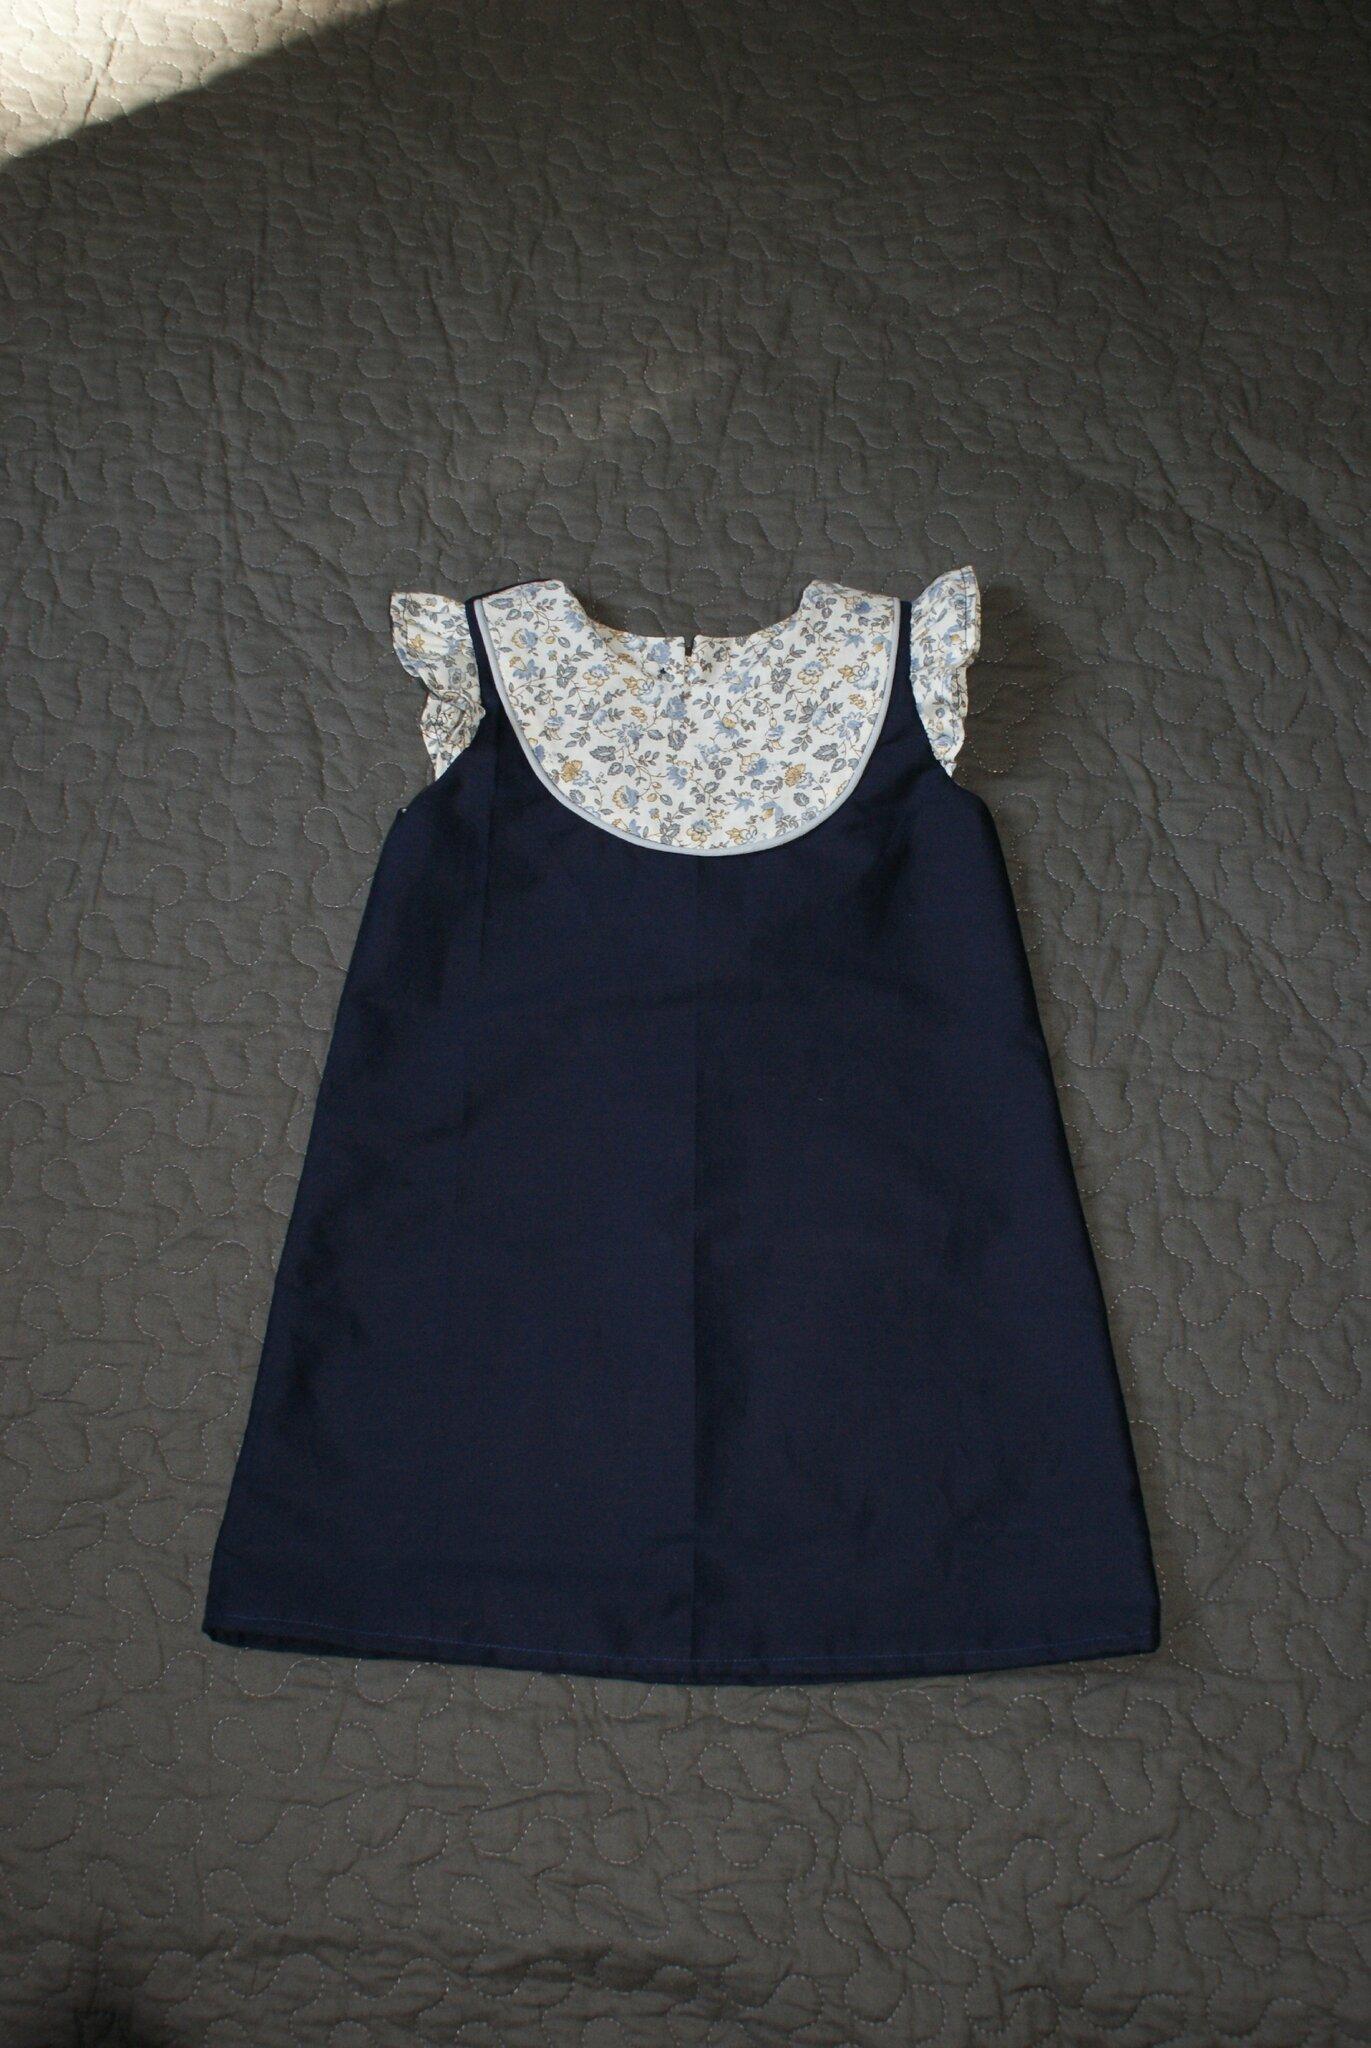 My Kate's dress!